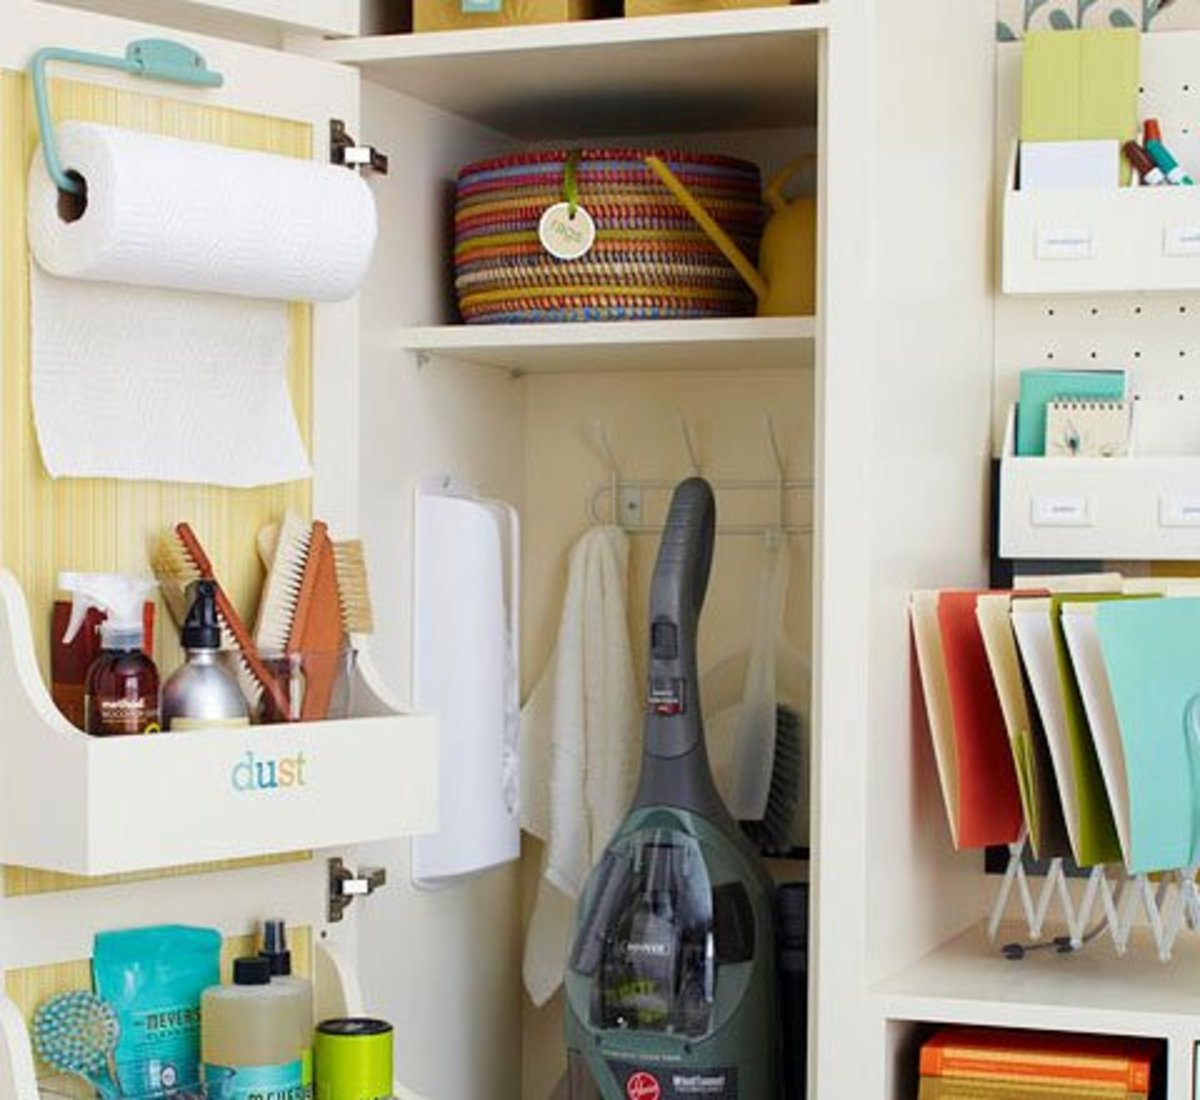 Cupboard Door Organizer Rack   Easy Organization Ideas for the Home